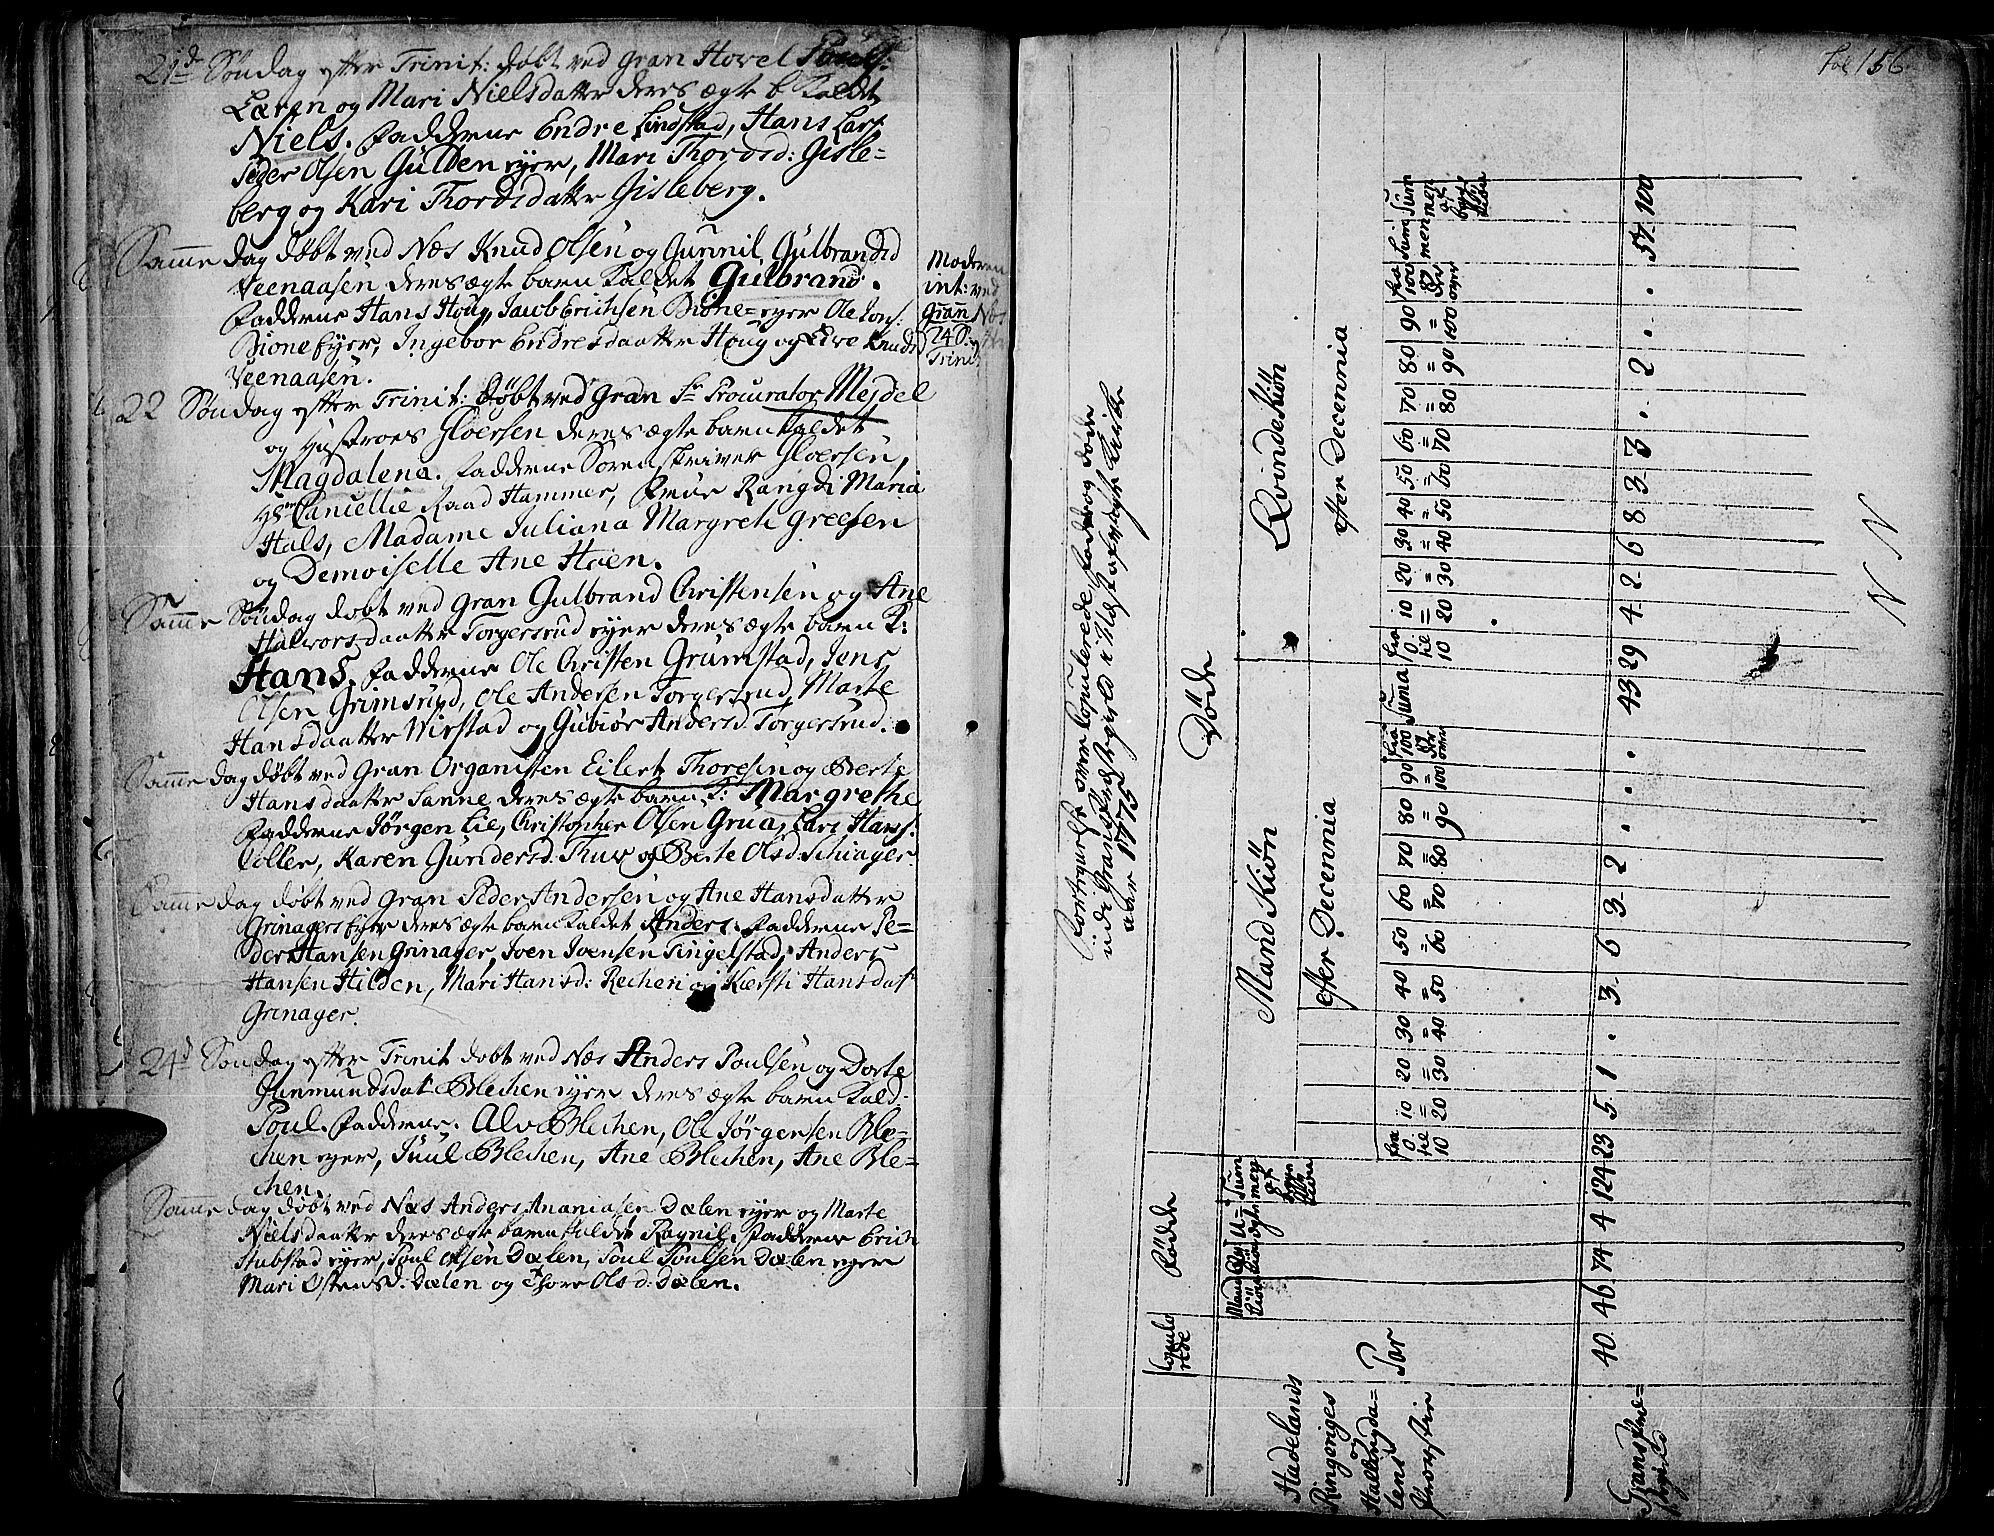 SAH, Gran prestekontor, Ministerialbok nr. 4, 1759-1775, s. 156